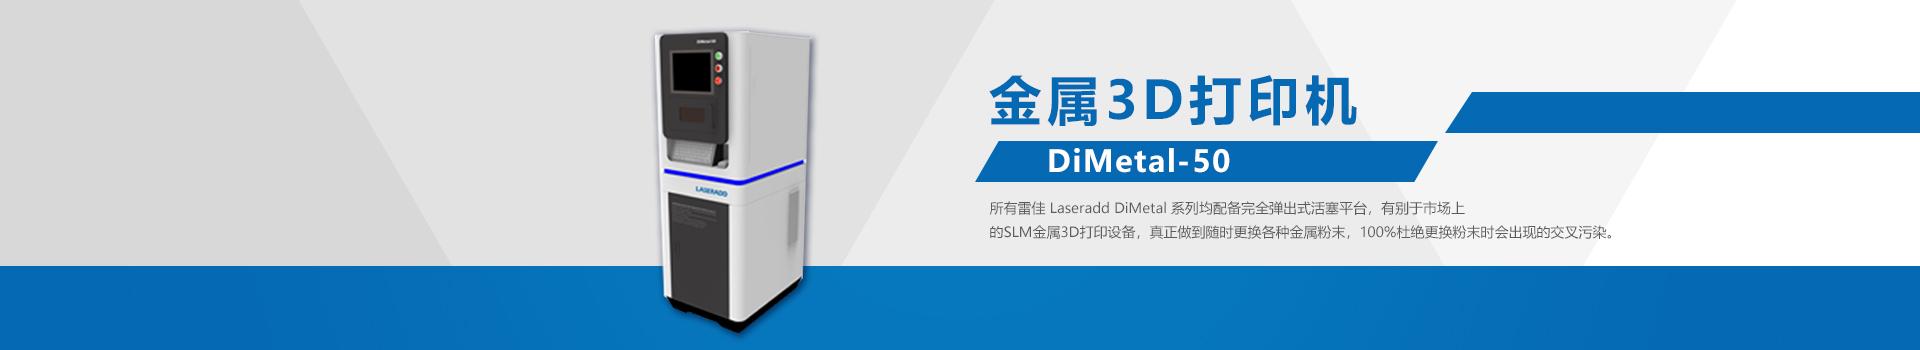 DiMetal-50 金属澳门新葡新京游戏官网